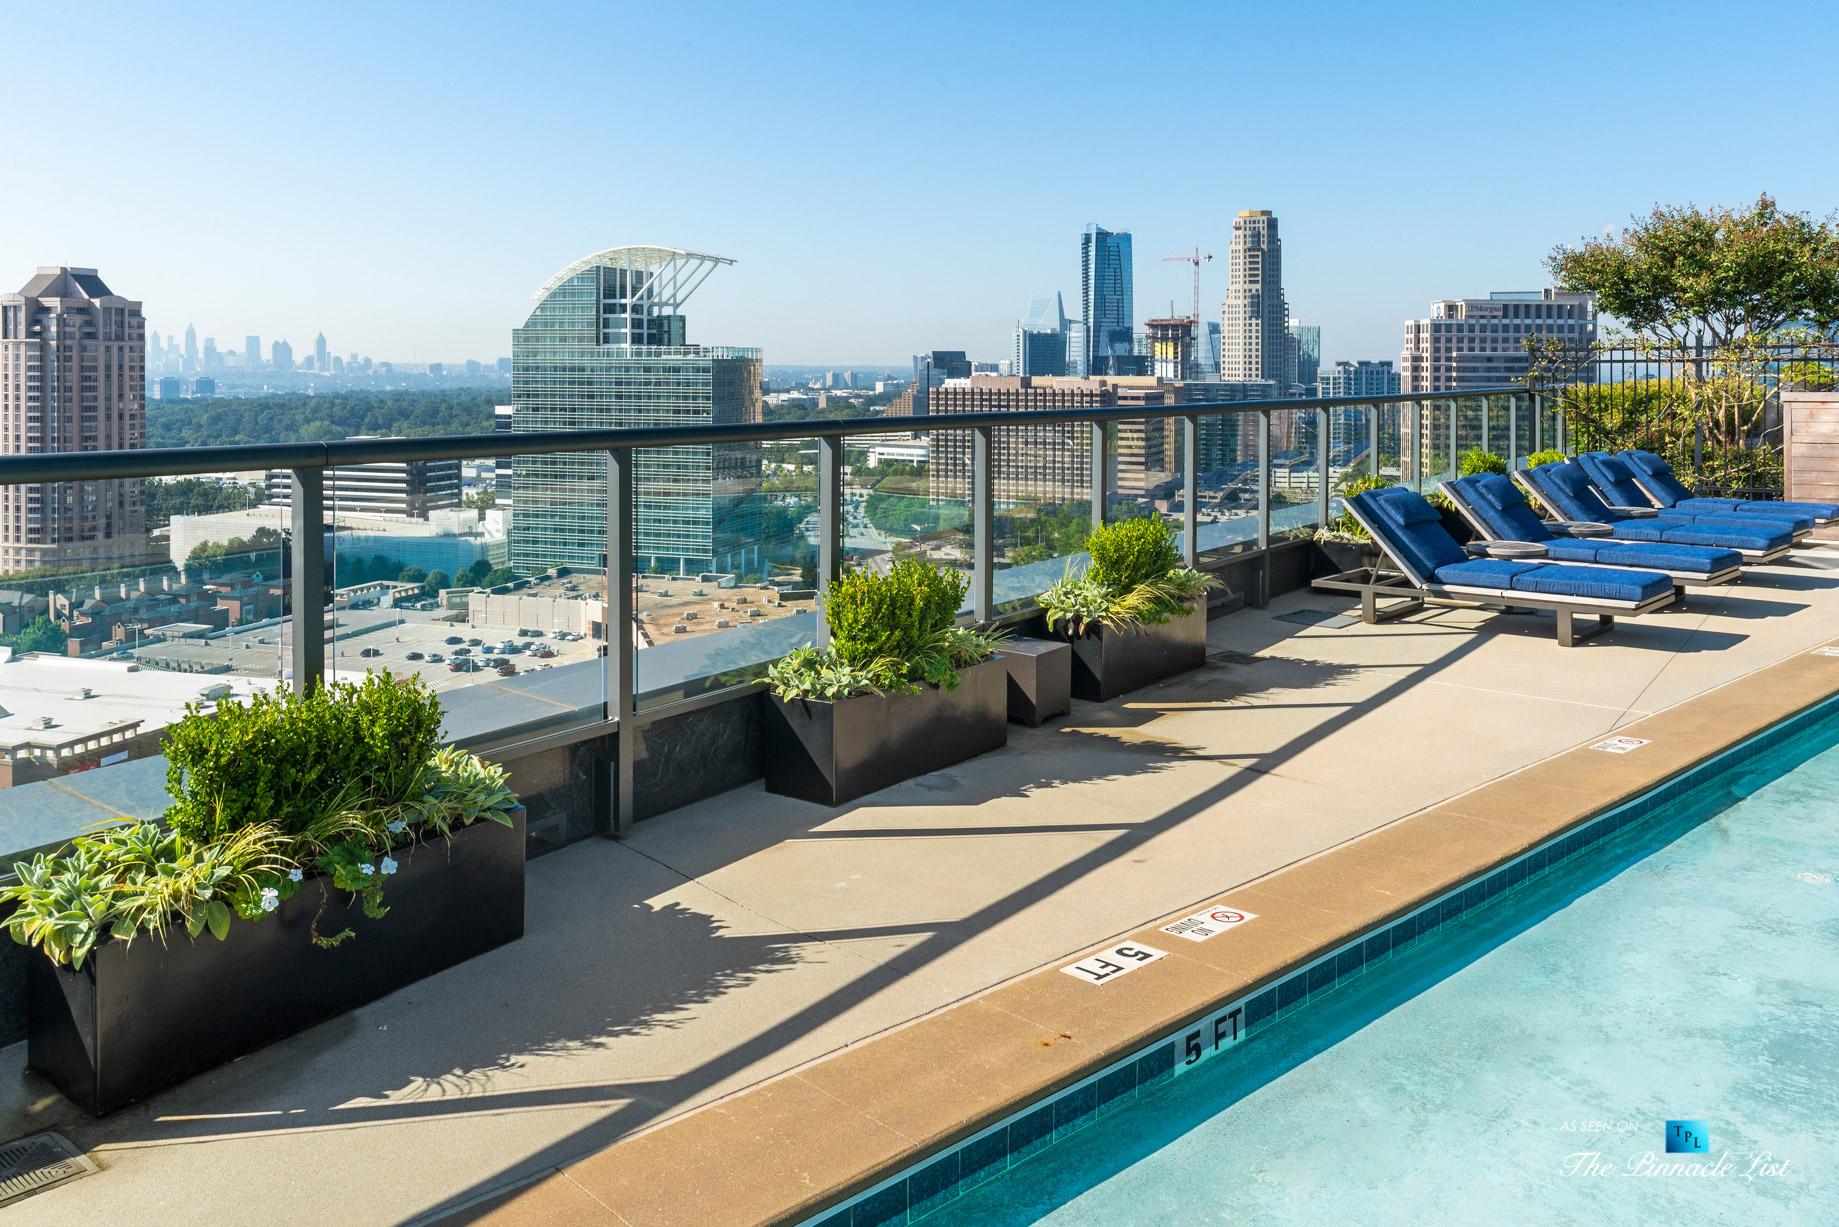 3630 Peachtree Rd NE, Unit 2808, Atlanta, GA, USA – Condo Exterior Pool View – Luxury Real Estate – The Ritz-Carlton Residences Buckhead